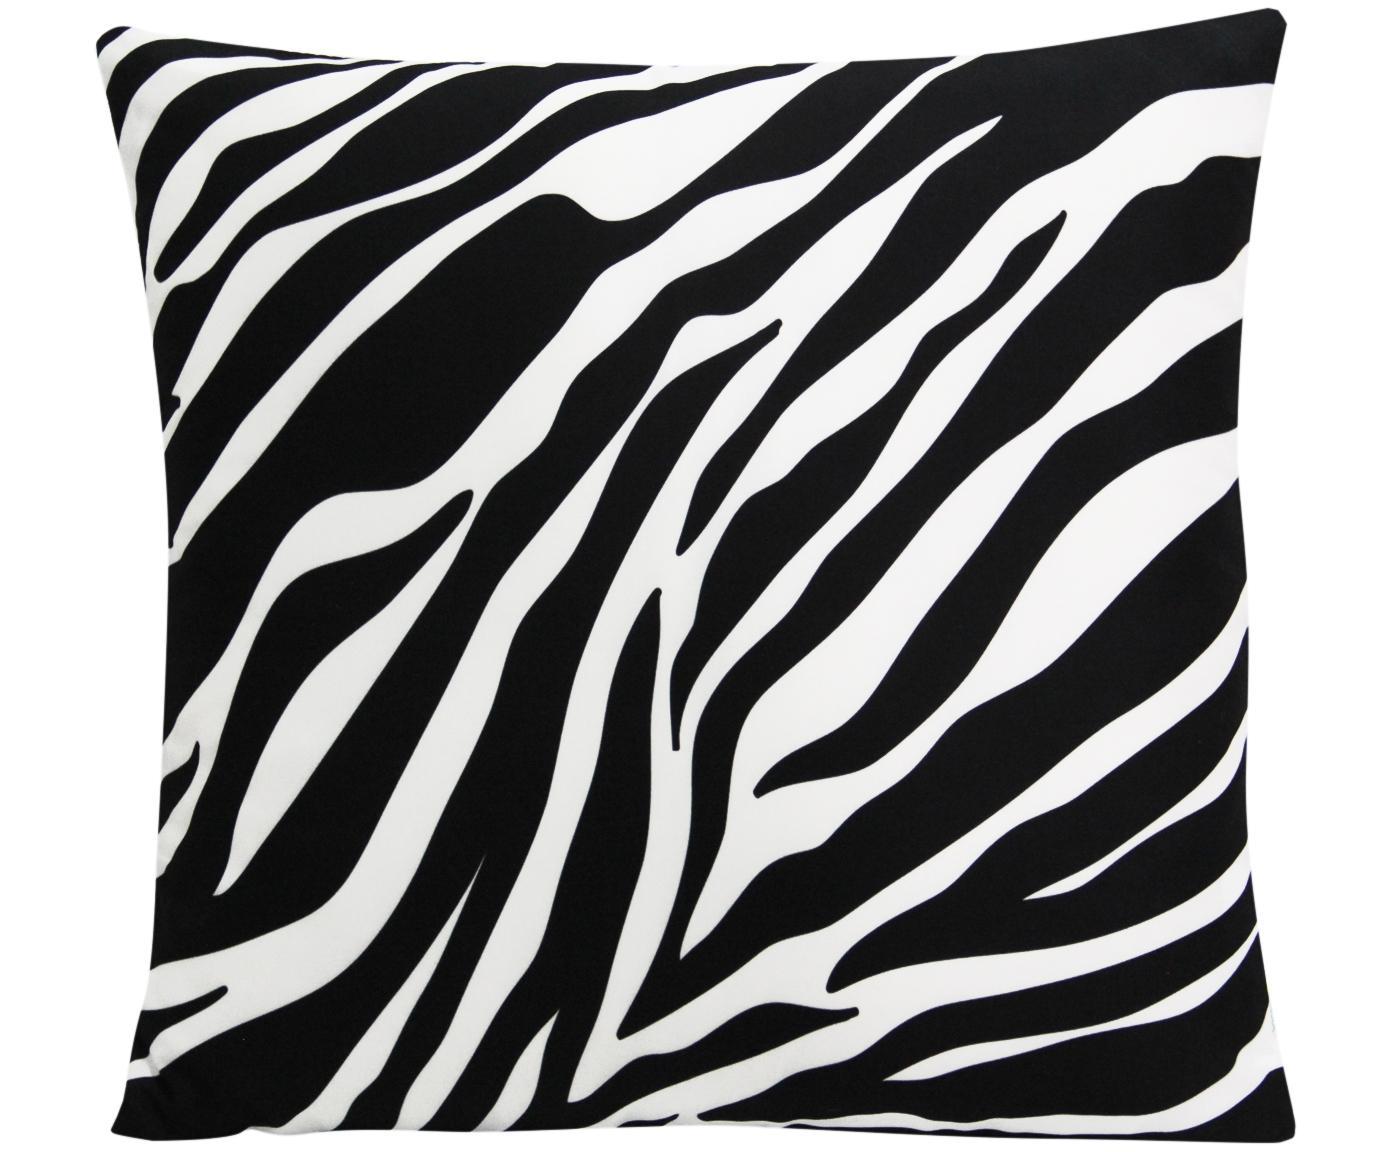 Kussenhoes Pattern met zebra print in zwart/wit, Polyester, Wit, zwart, 45 x 45 cm